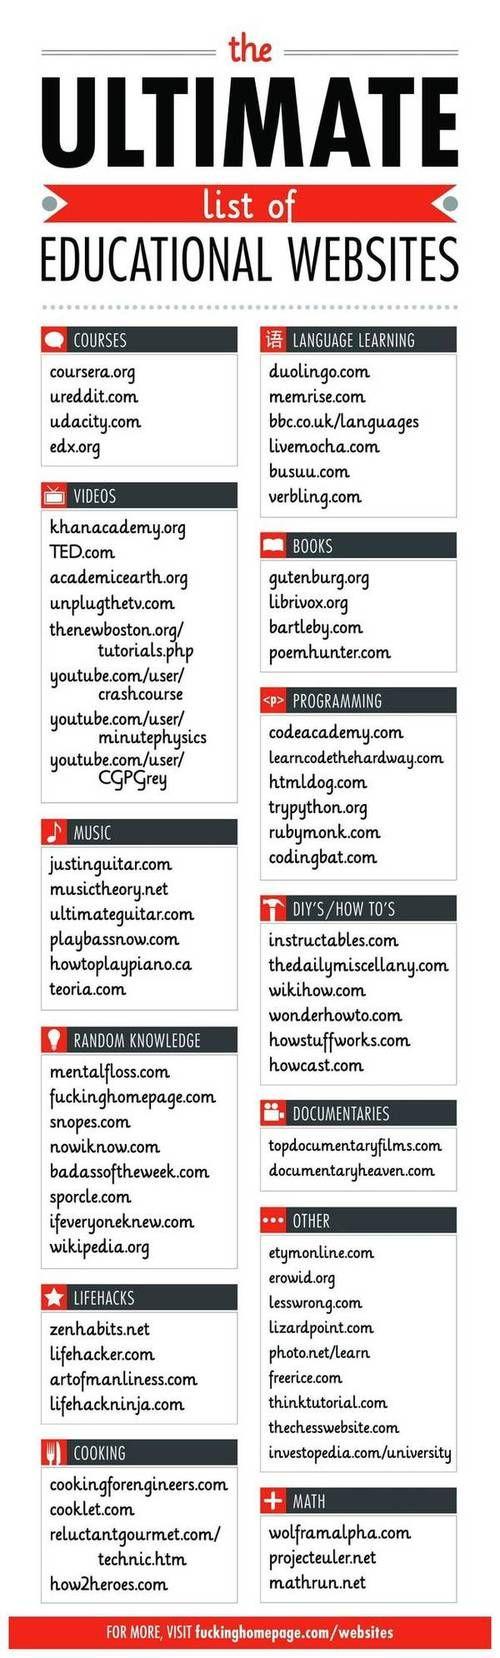 Ultimate List of Educational Websites 6518_087a_500